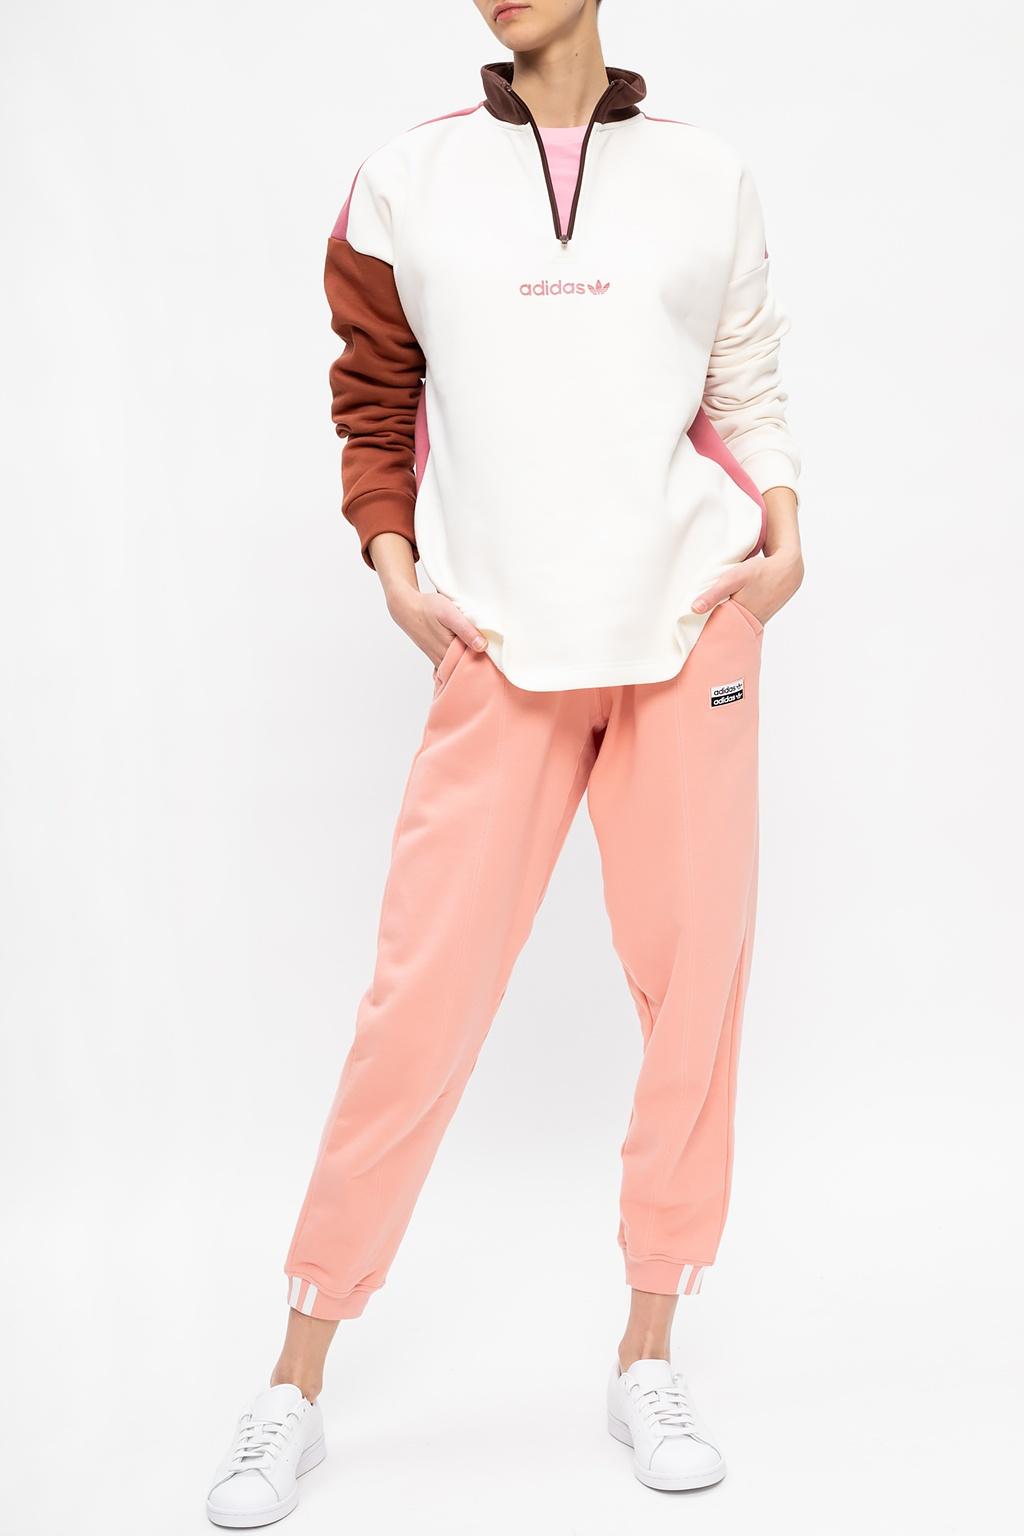 ADIDAS Originals 品牌运动衫